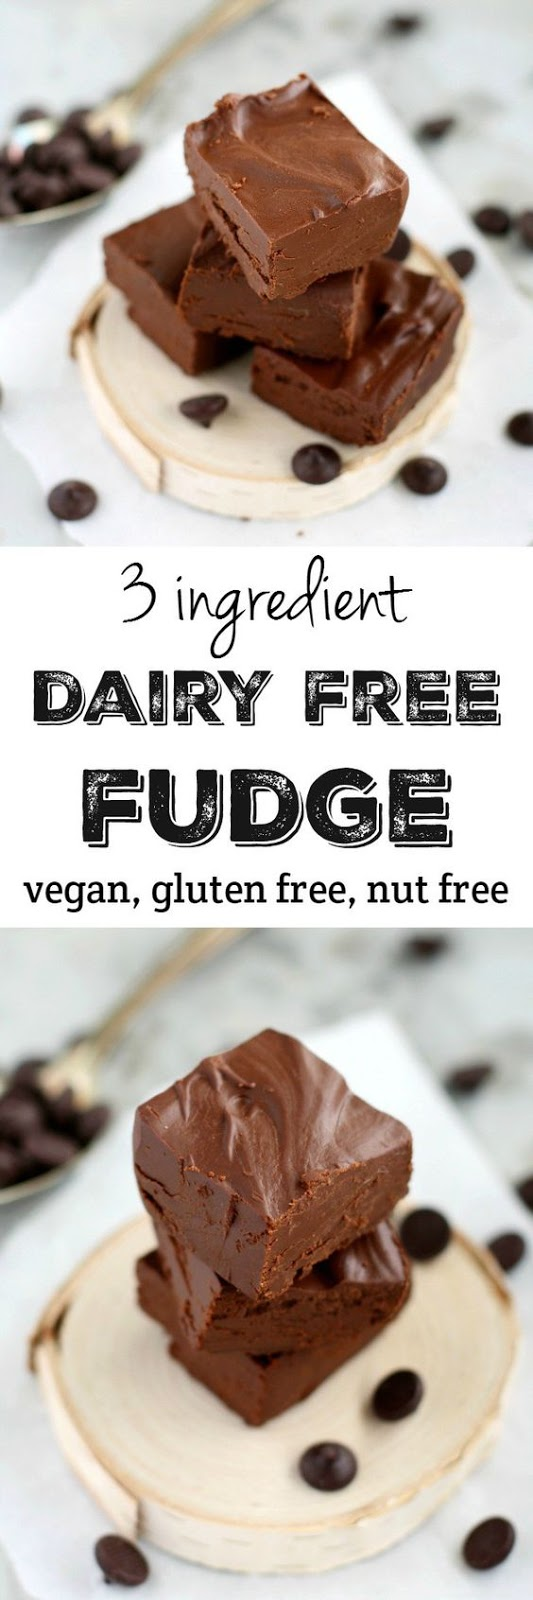 3 Ingredient Dairy Free Fudge.